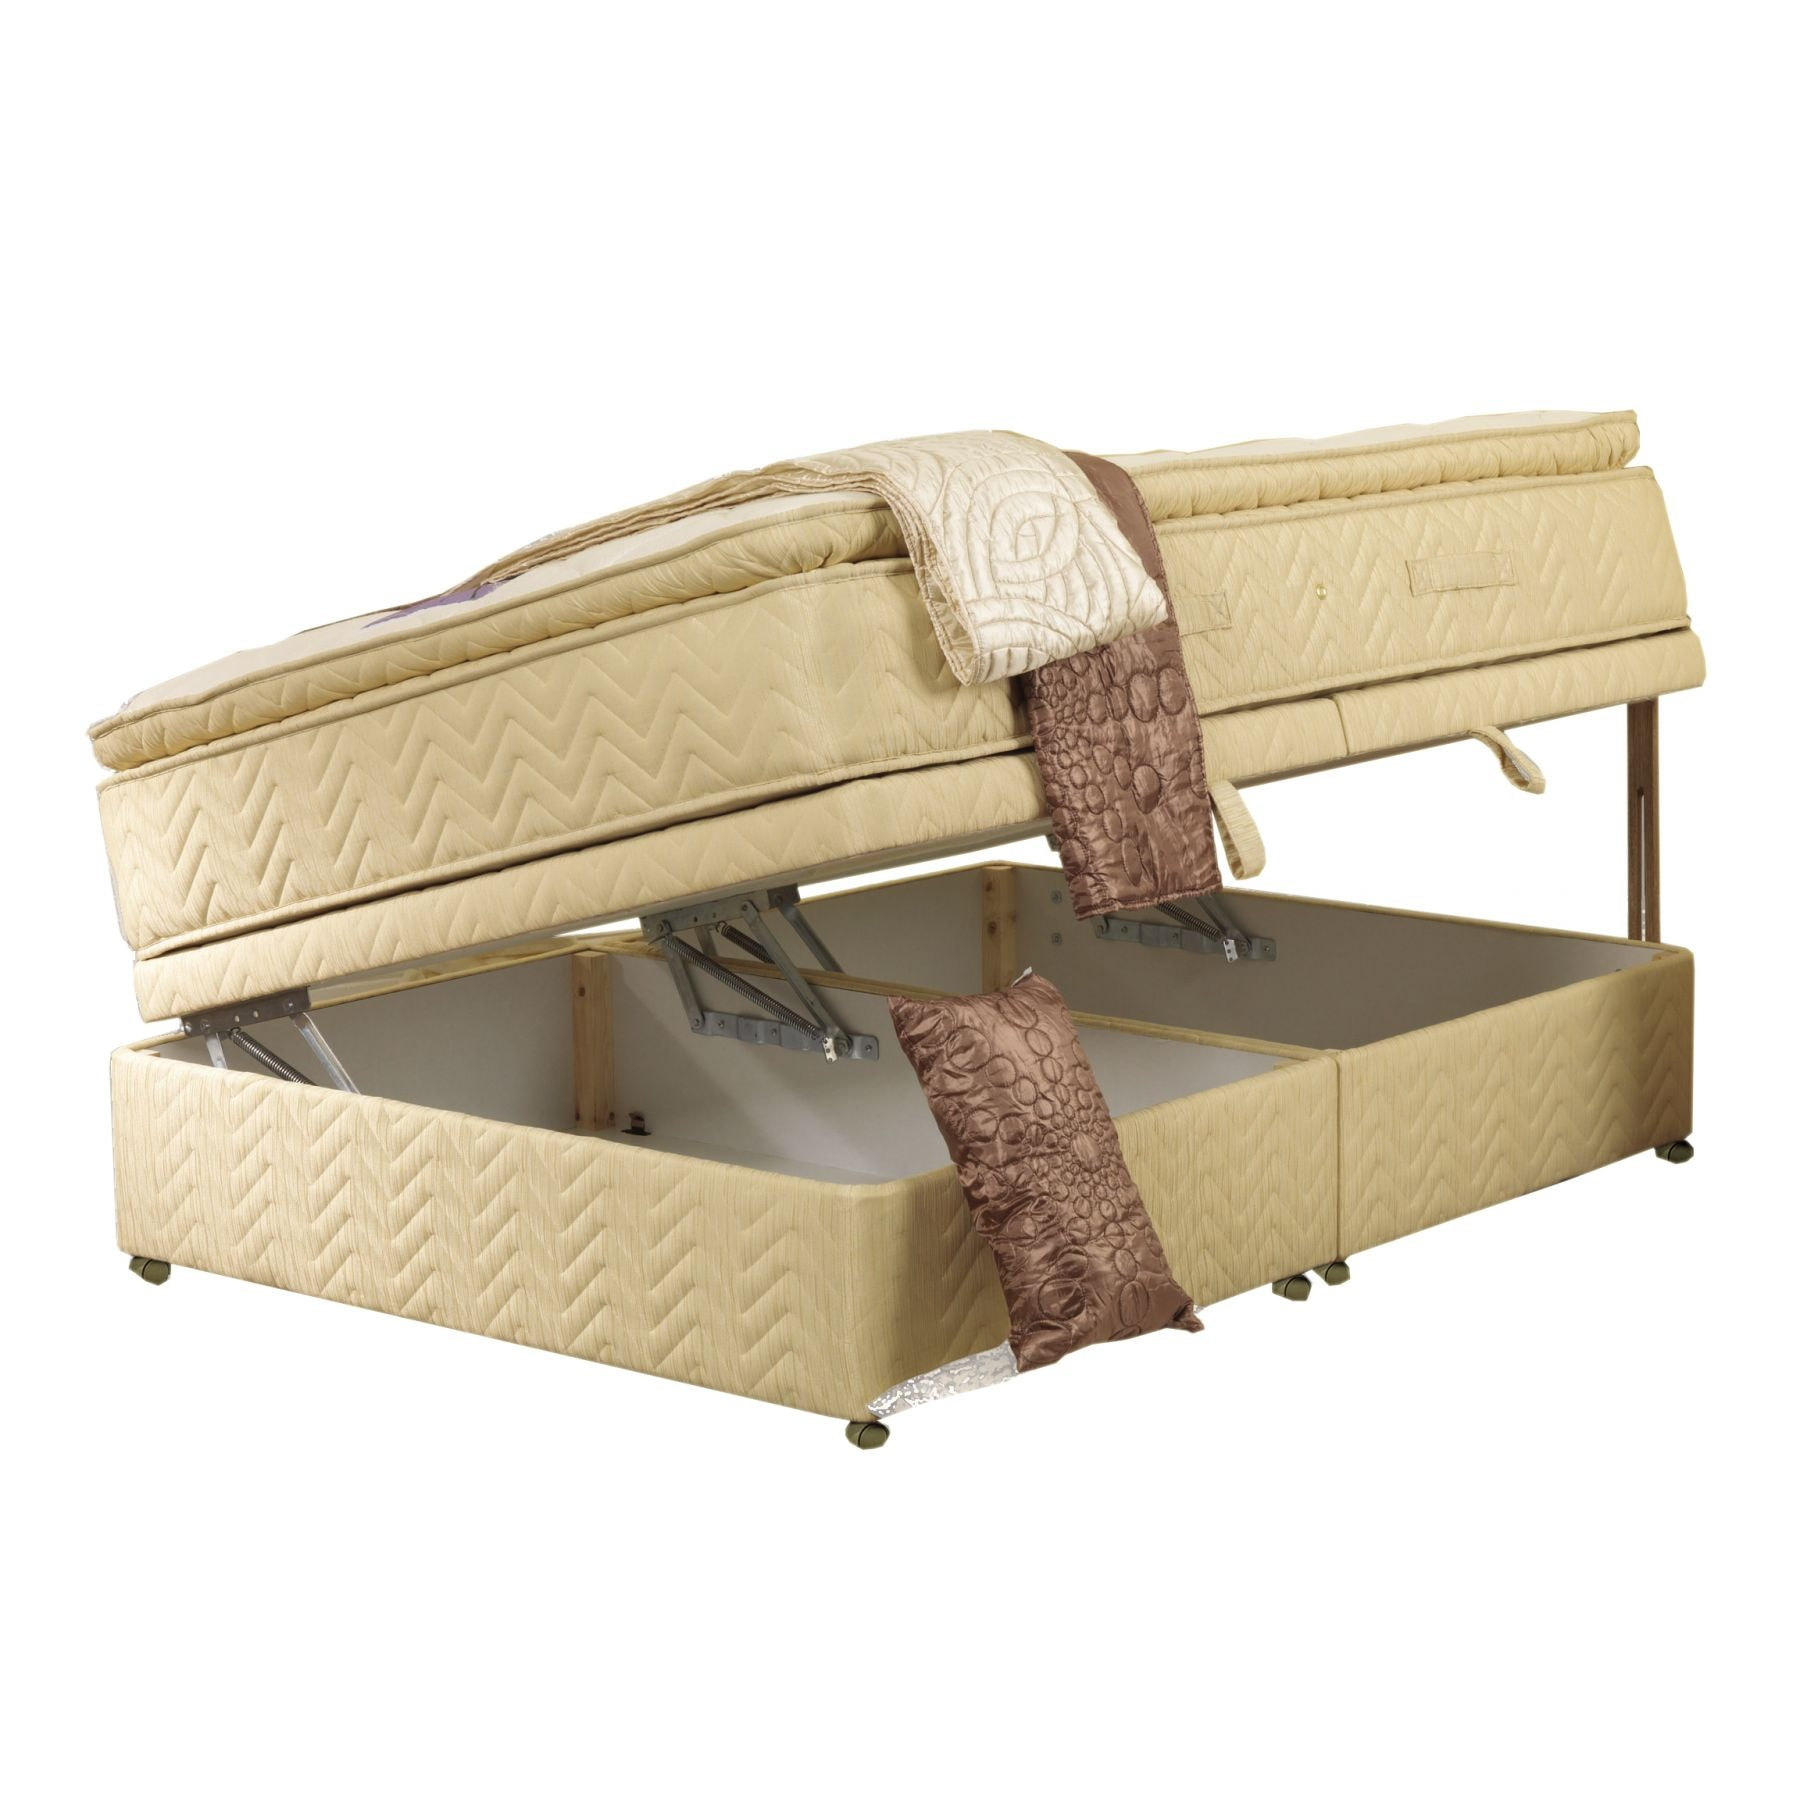 Temperate divan base mattress for Divan base direct